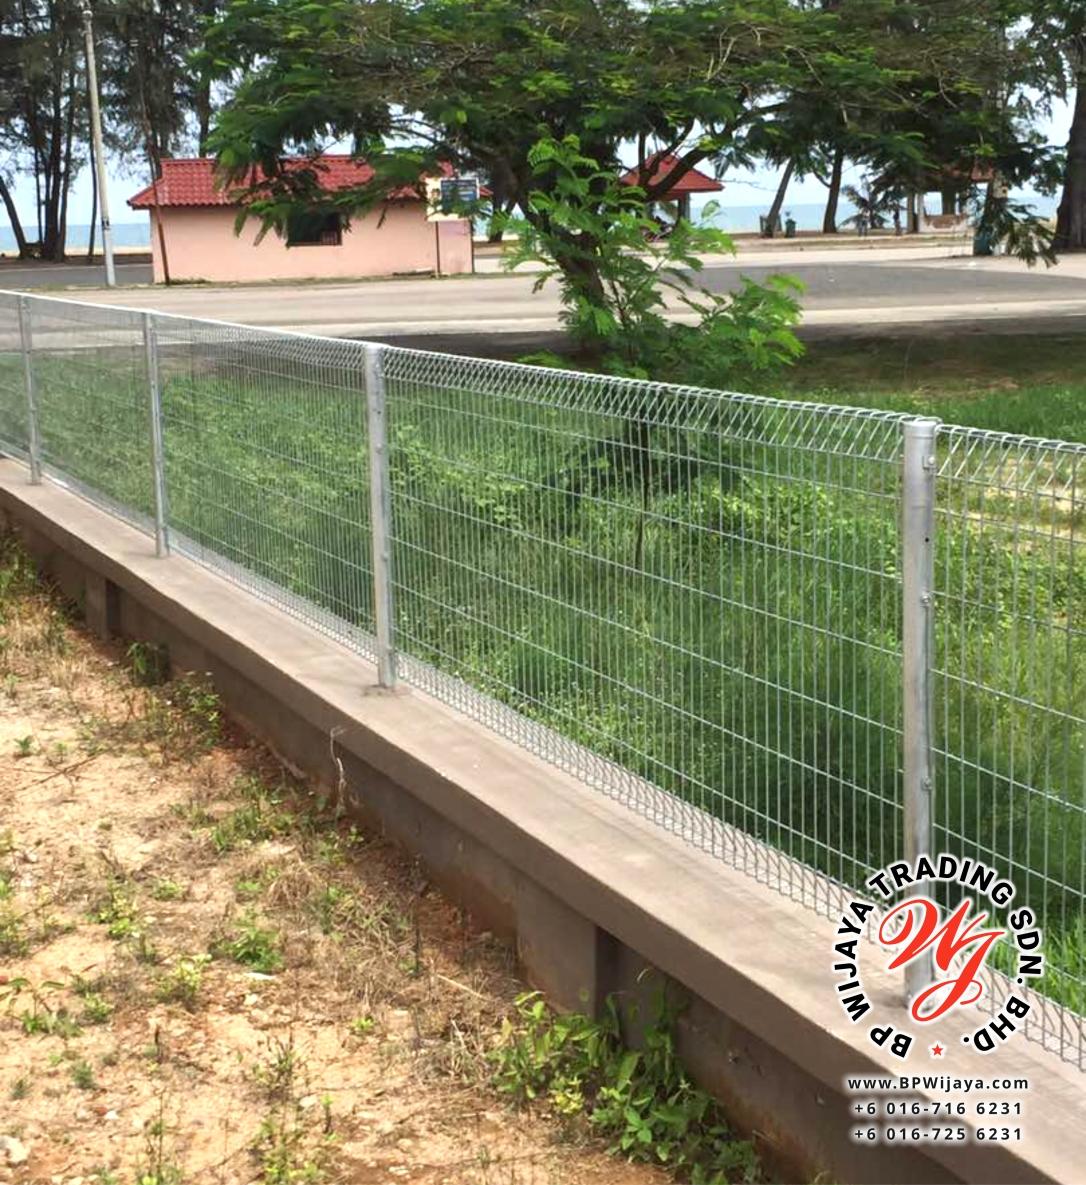 BP Wijaya Trading Sdn Bhd Malaysia Johor Batu Pahat manufacturer of safety fences building materials Hotdip Galvanized Fence Mesh Wire Fence FA BRC B01